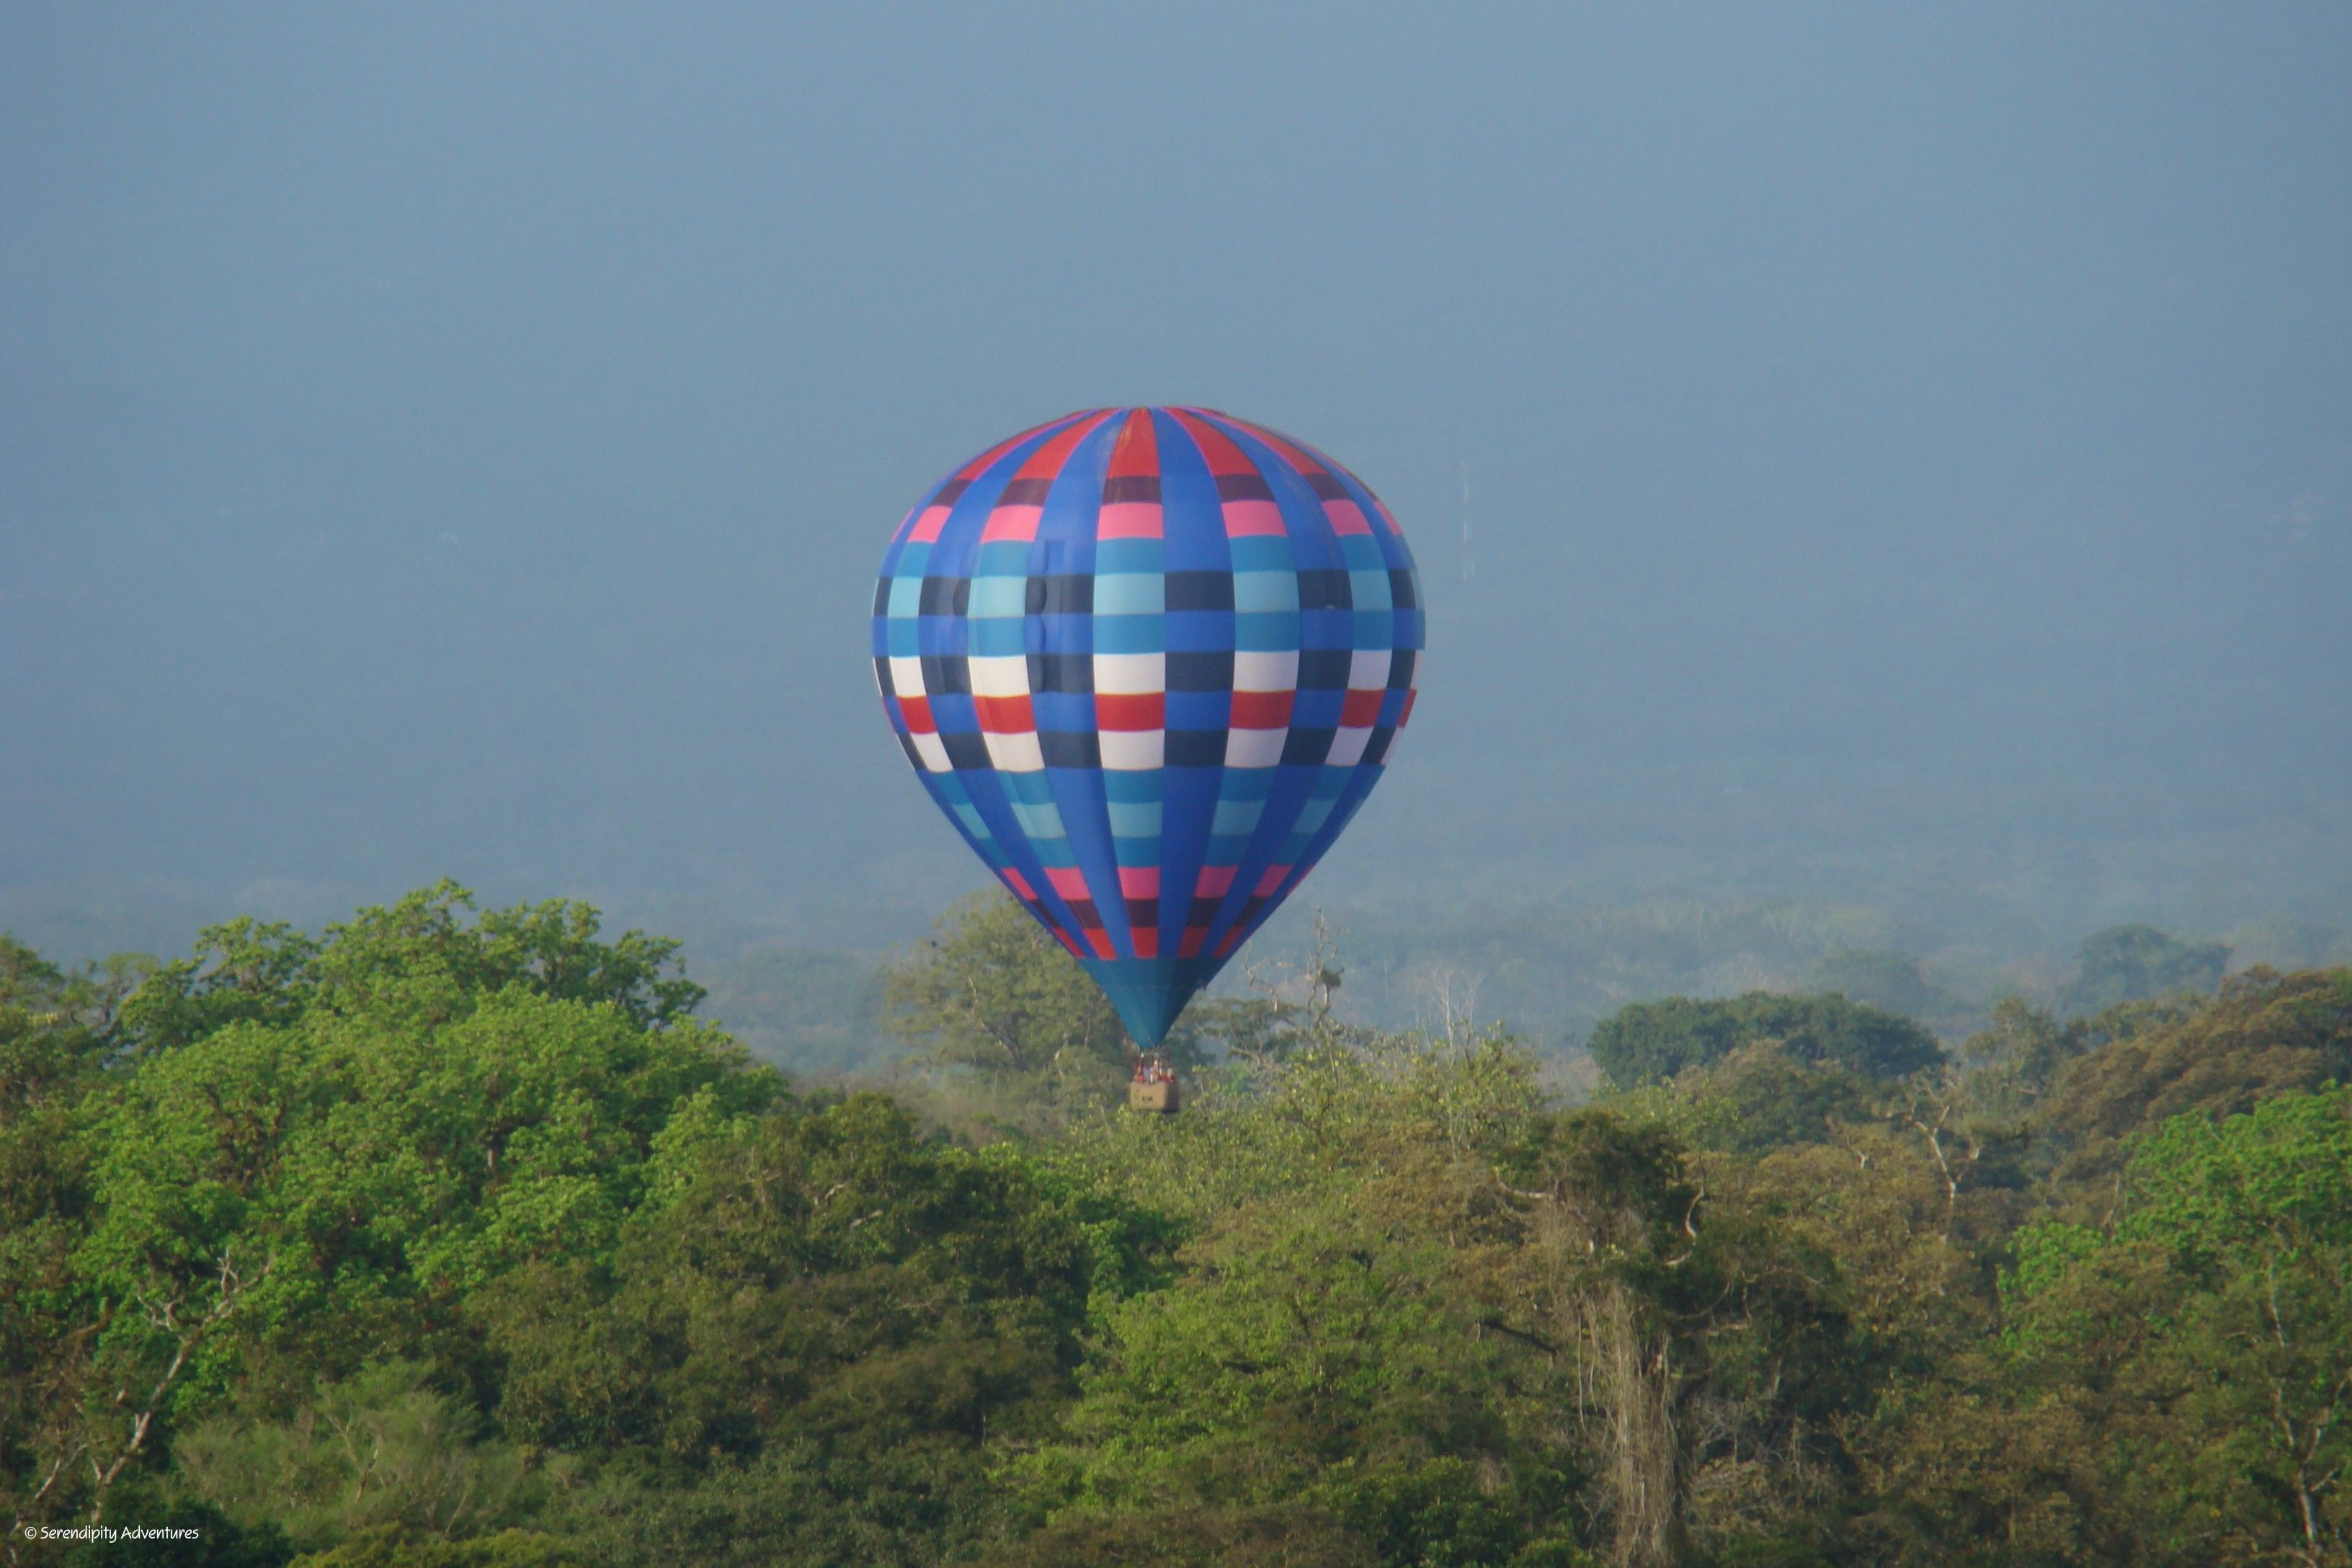 A hot air balloon flight over the rainforest of Costa Rica